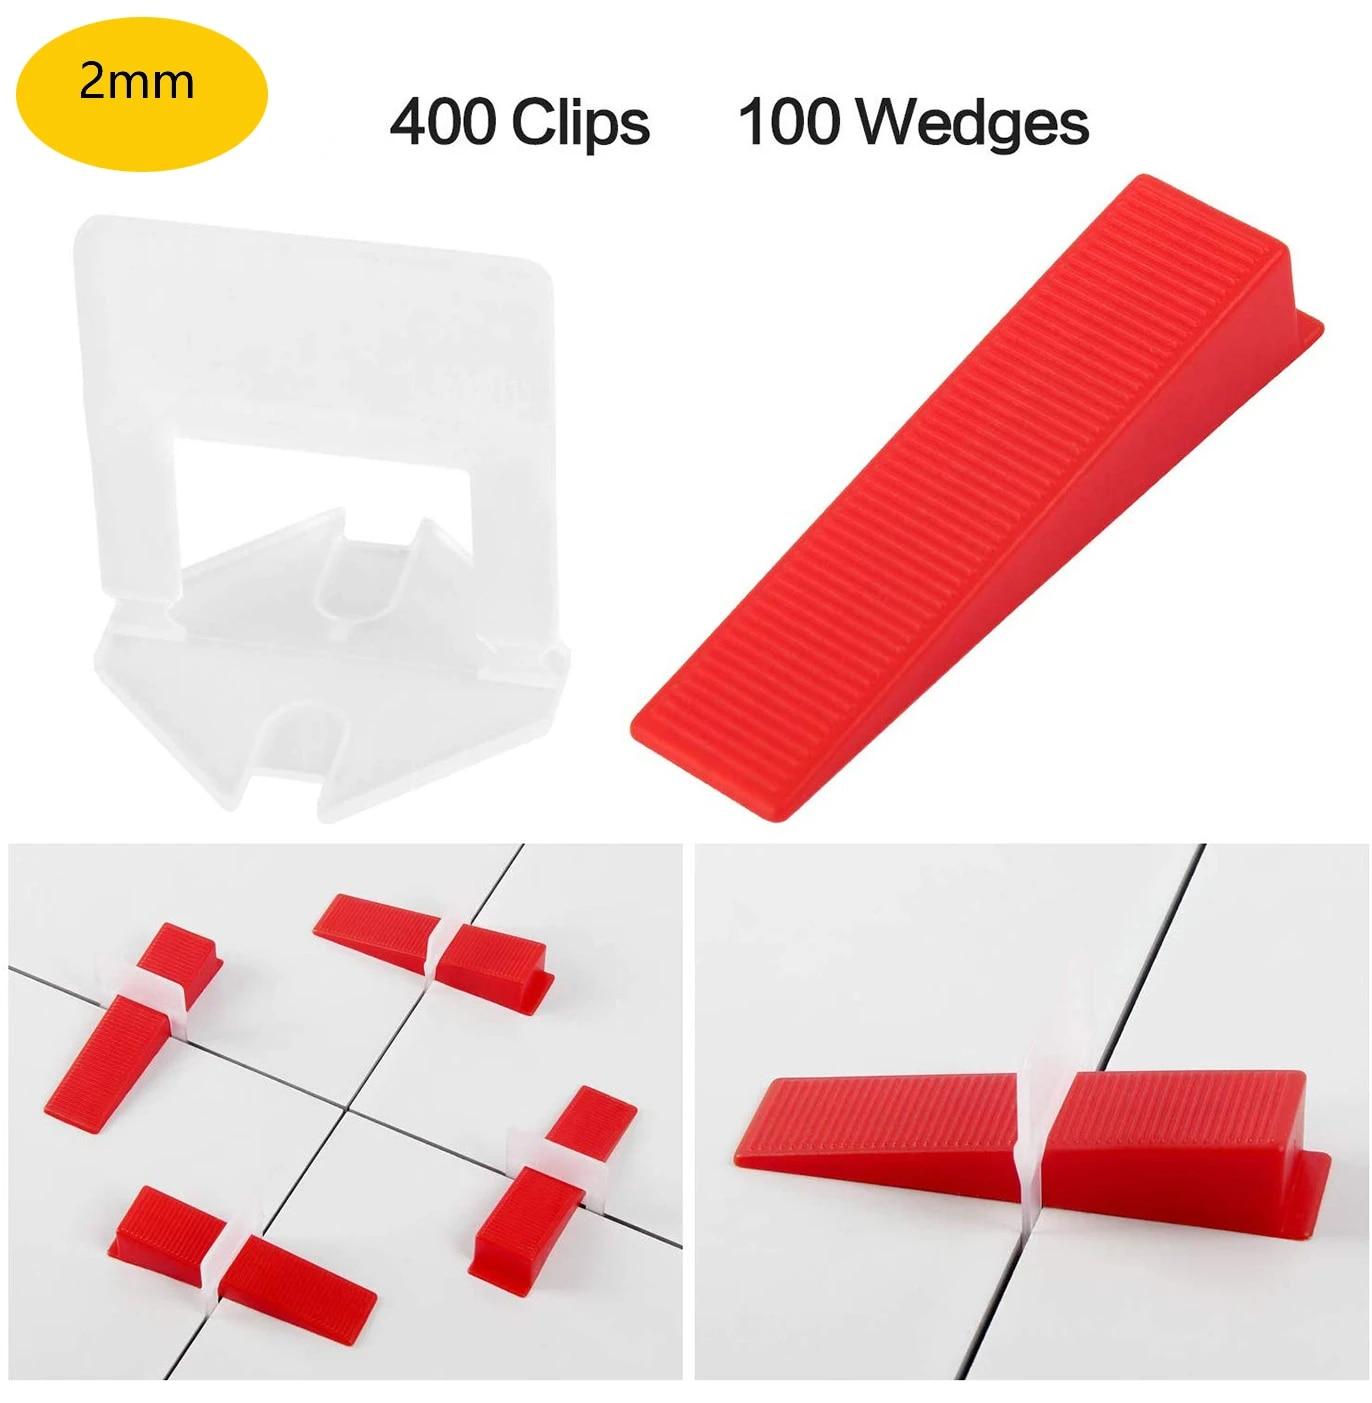 2mm tile leveling system 400pcs clips 100pcs reusable wedges self leveling plastic tile spacerst lock for floor wall ceramics